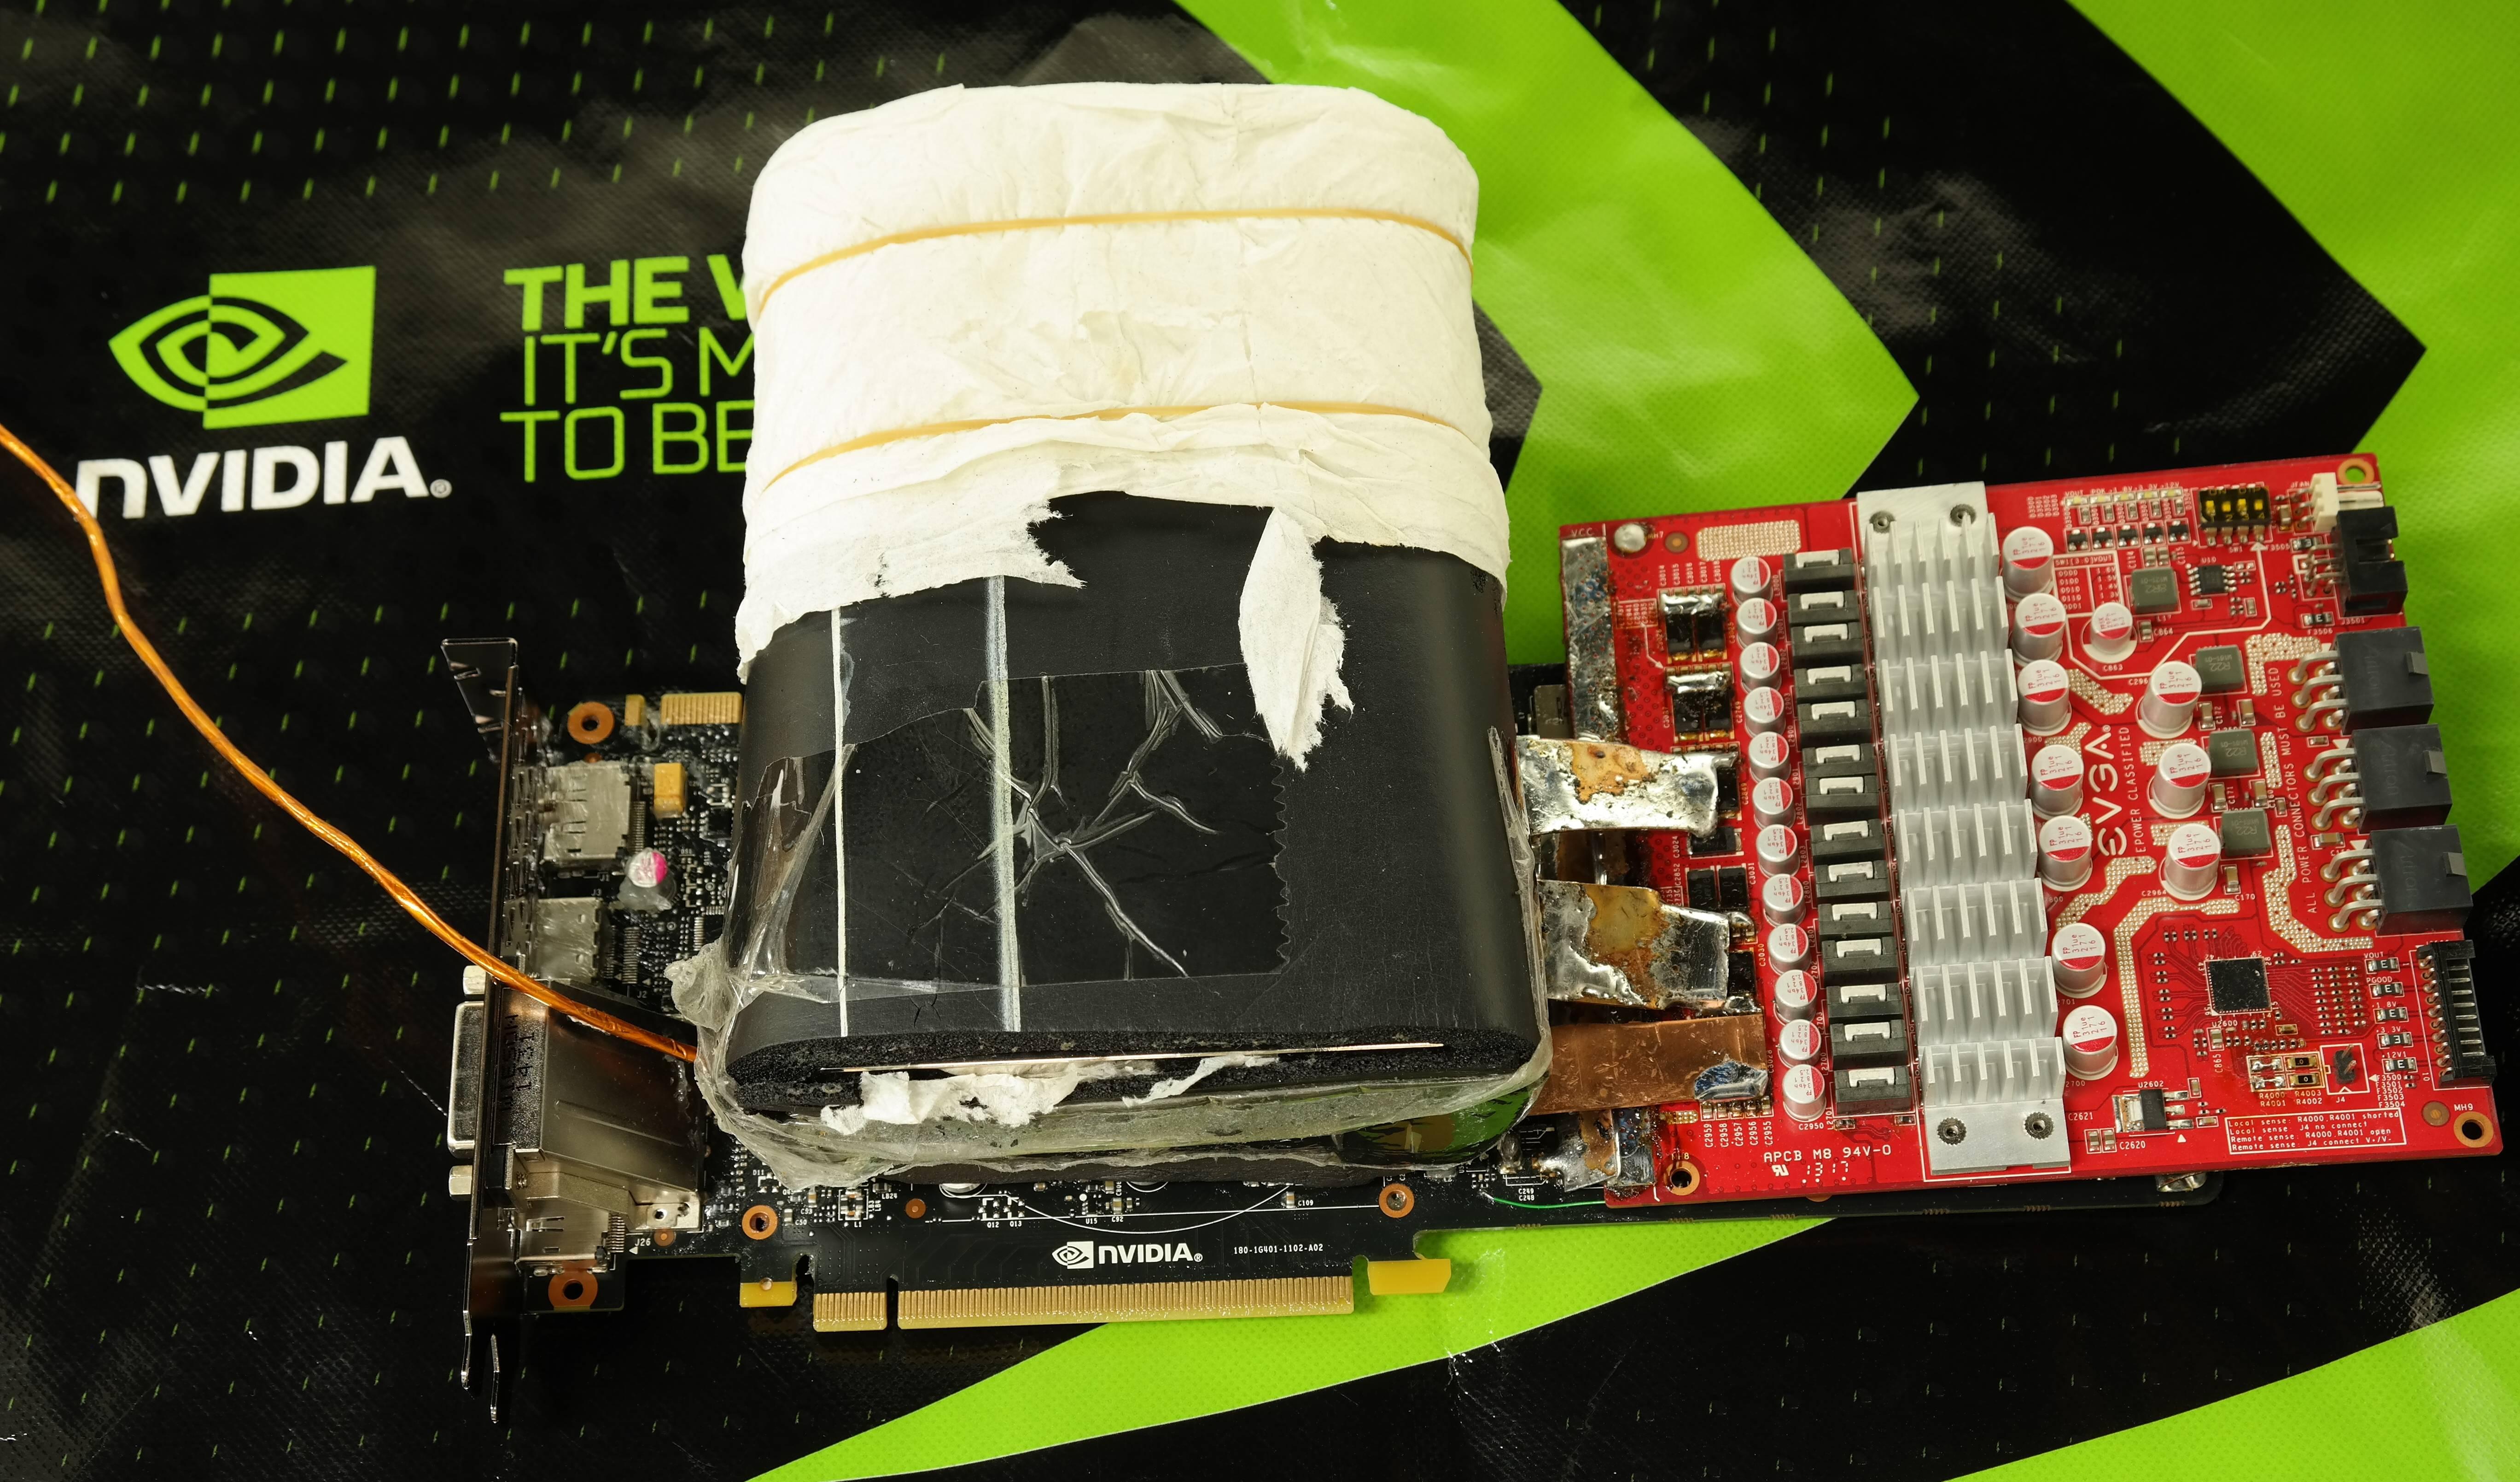 xDevs com | Extreme OC modifications for NVIDIA GeForce GTX 980